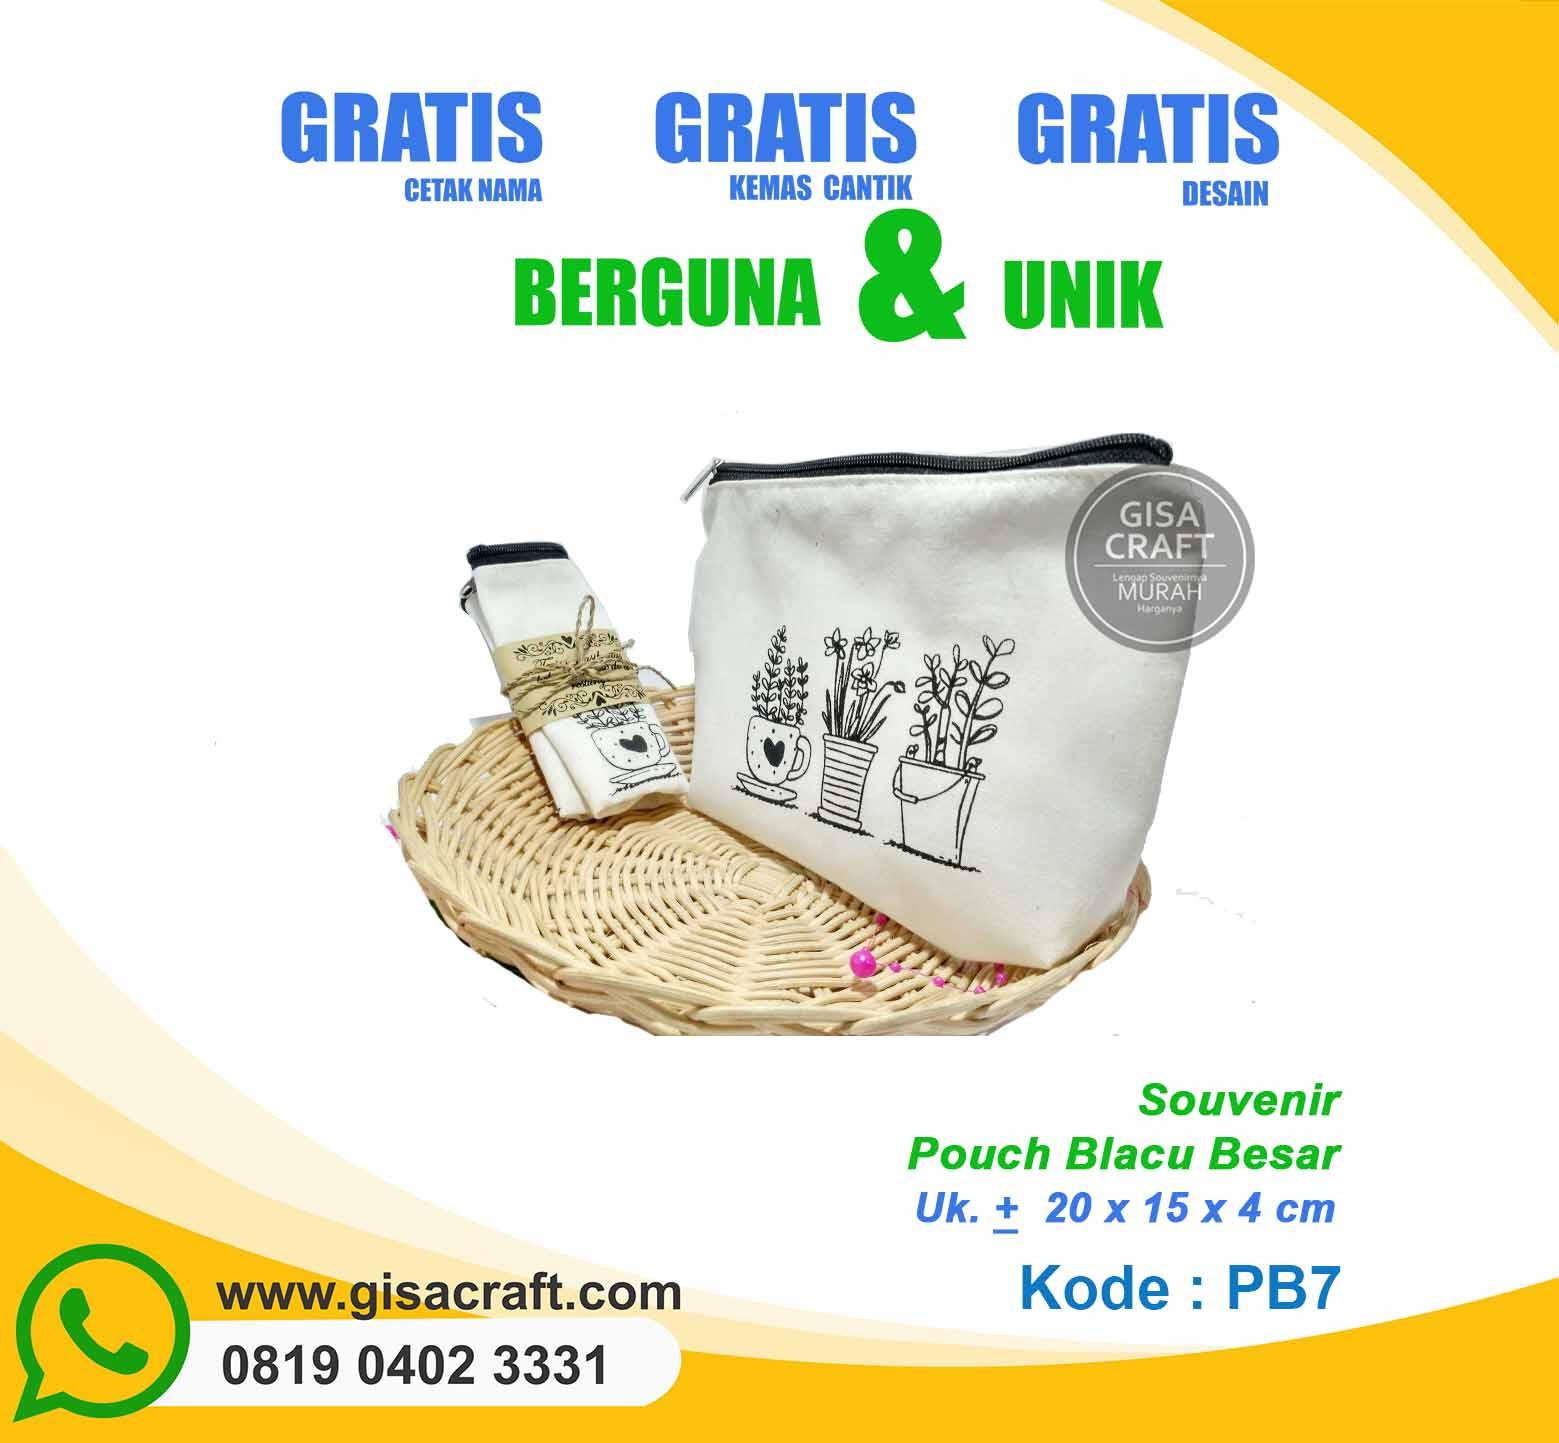 Souvenir Pouch Blacu Besar PB7